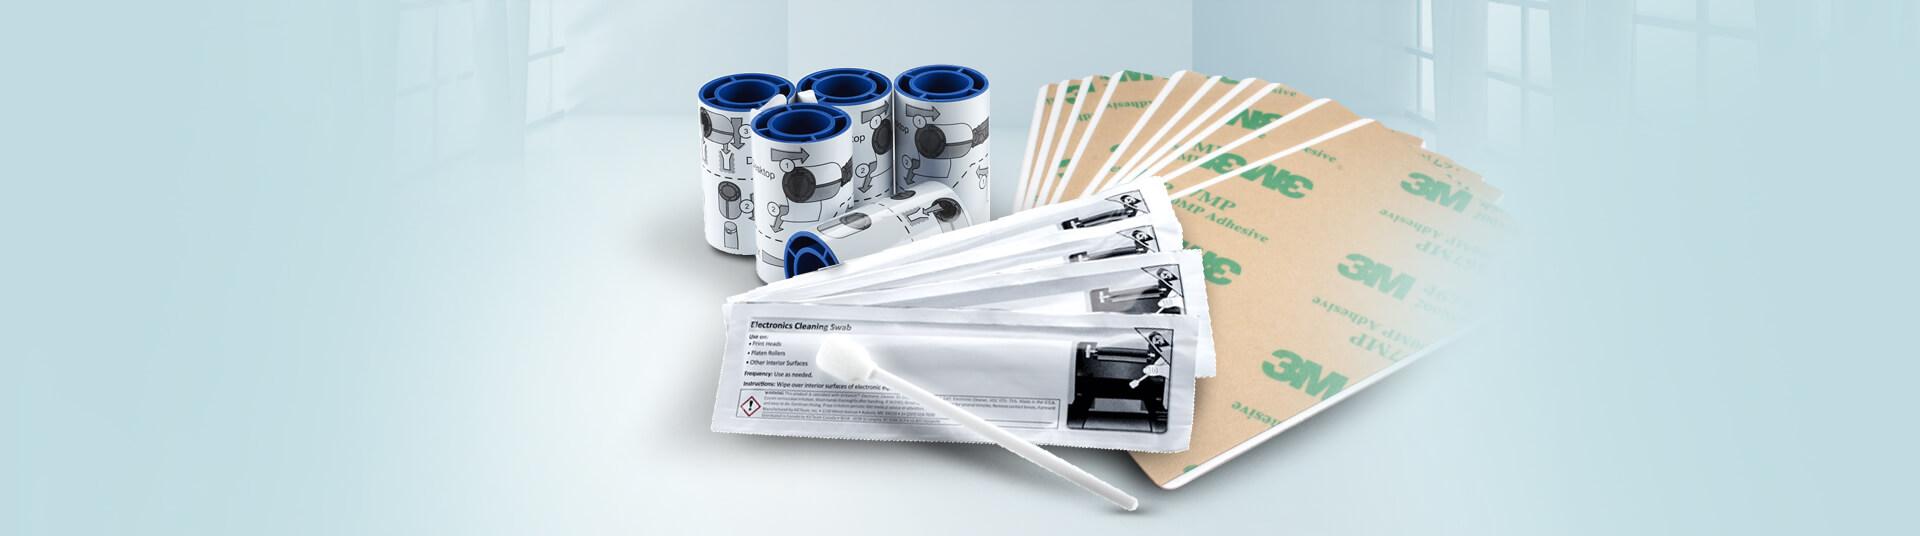 Entrust Datacard Cleaning Kits